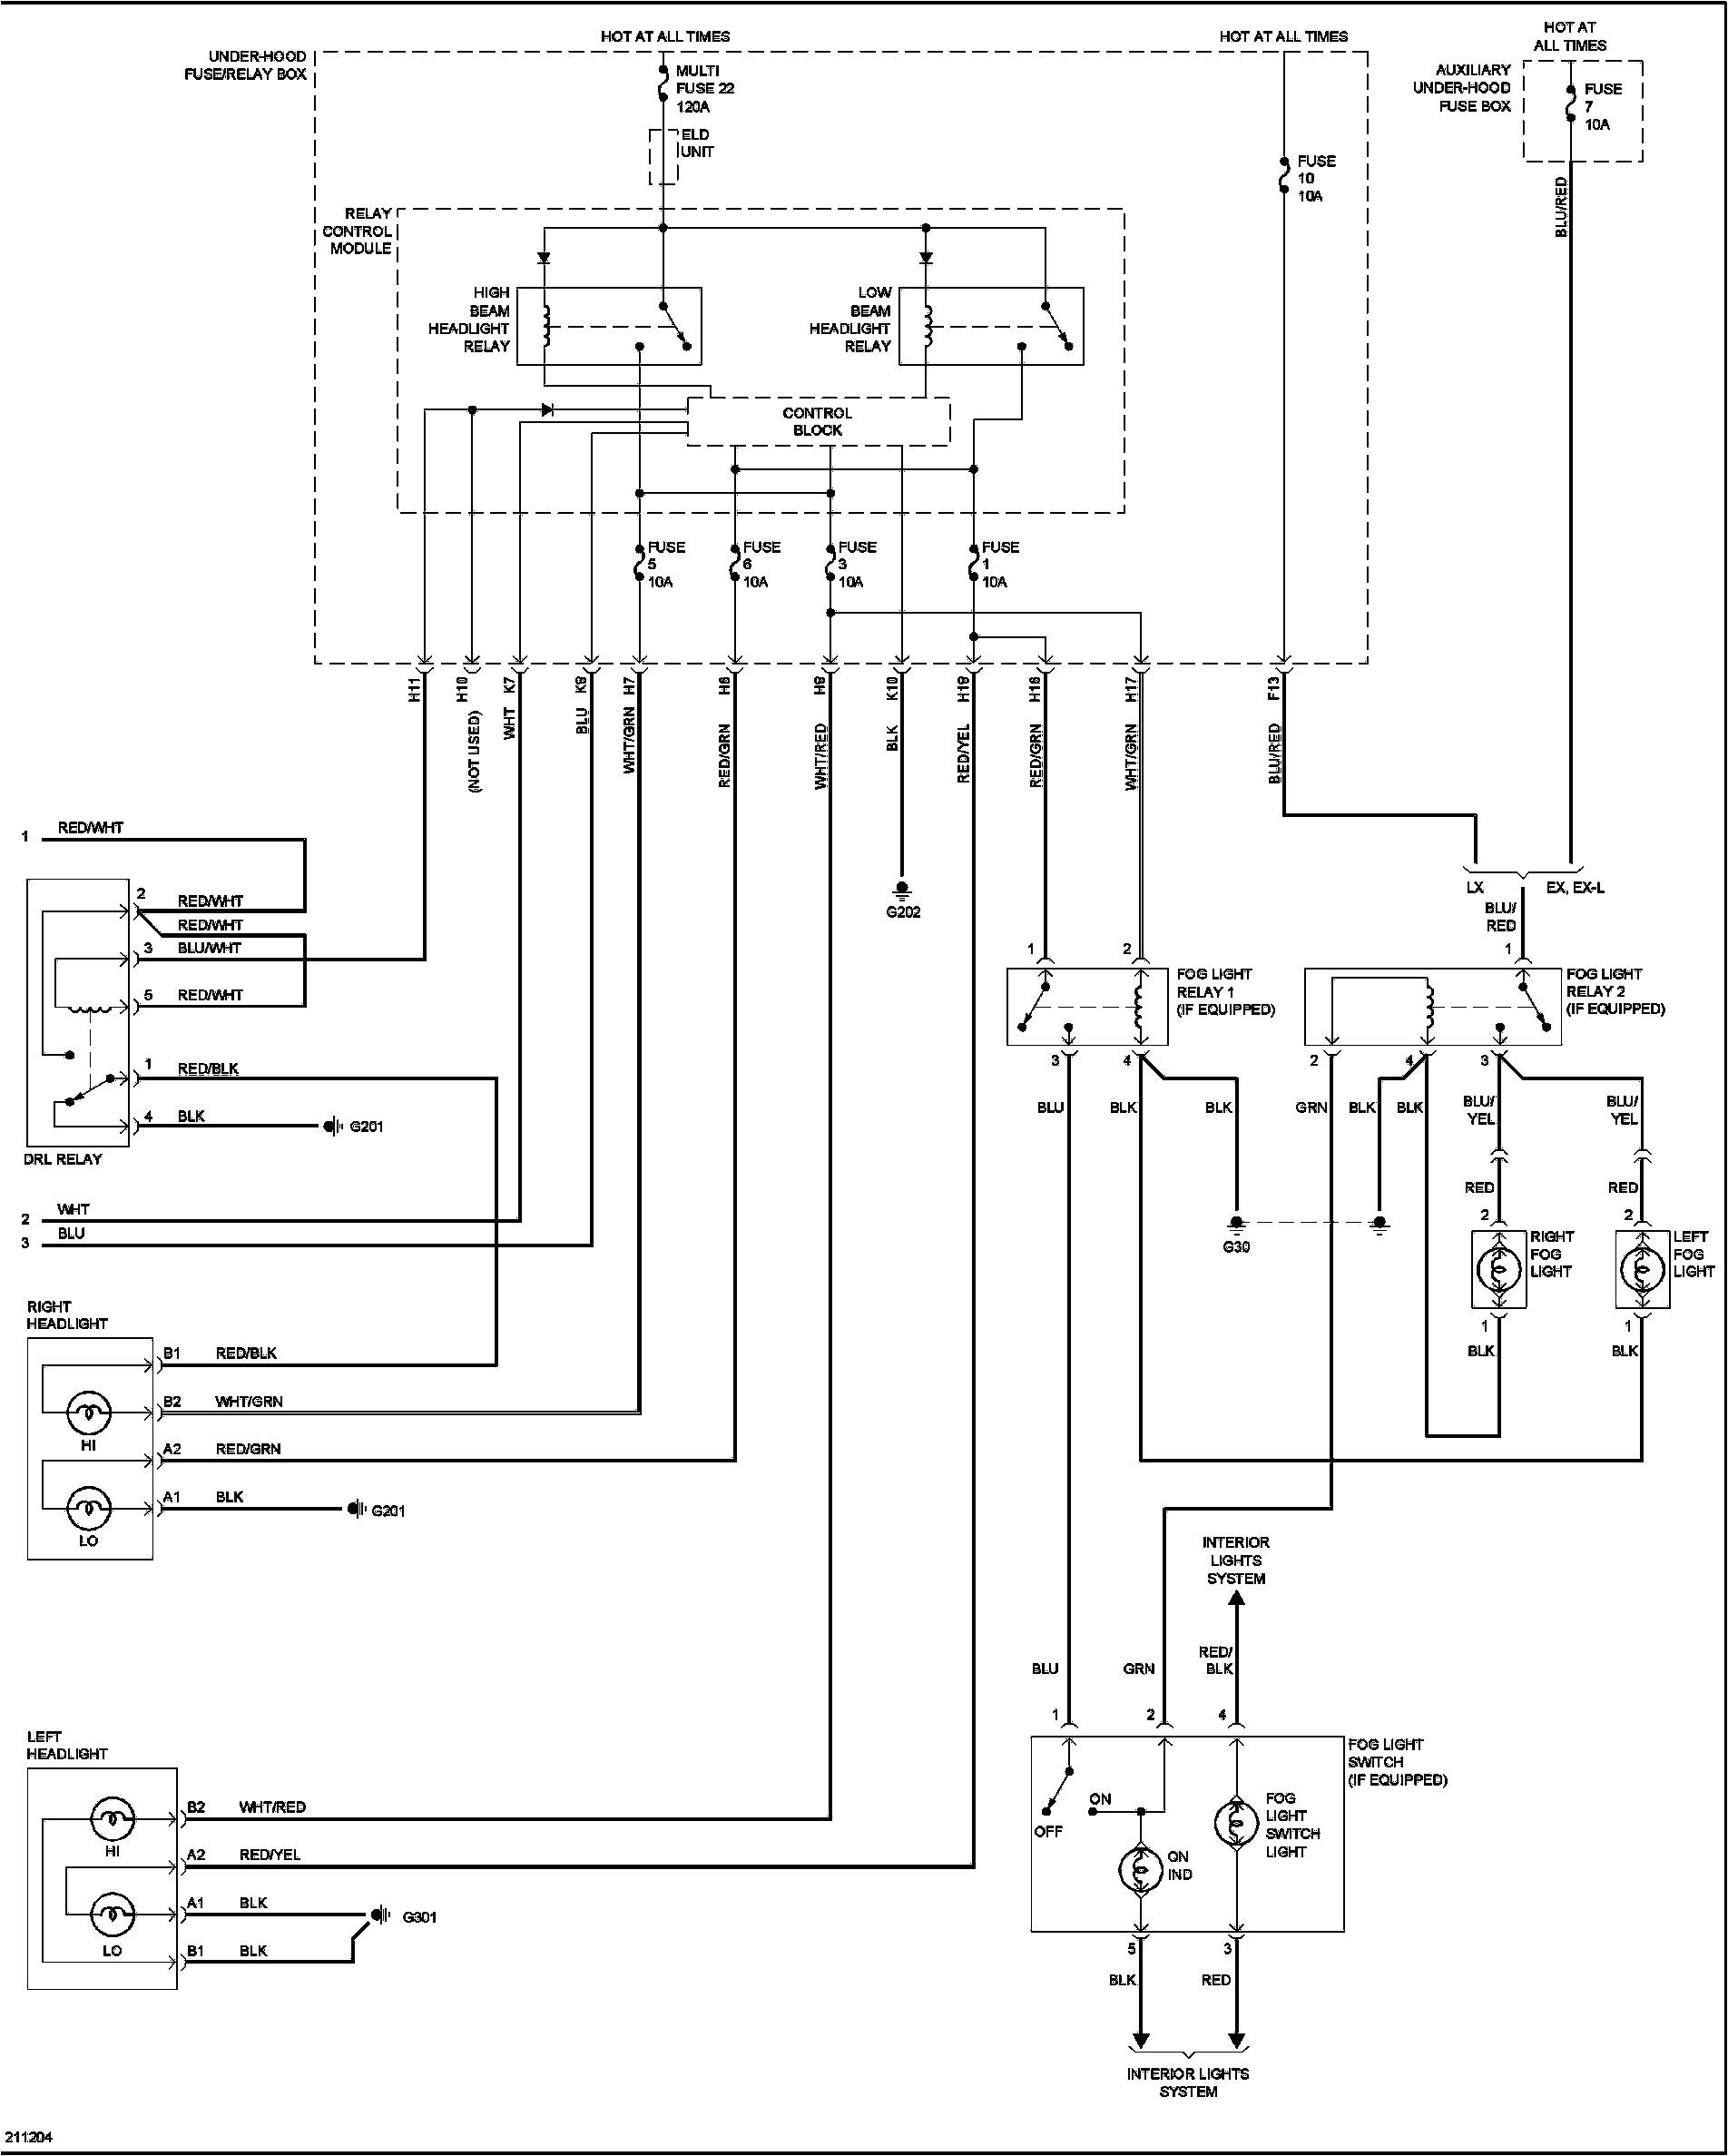 2000 honda civic ac wiring wiring diagram today 2006 civic ac wiring diagram 2000 honda civic